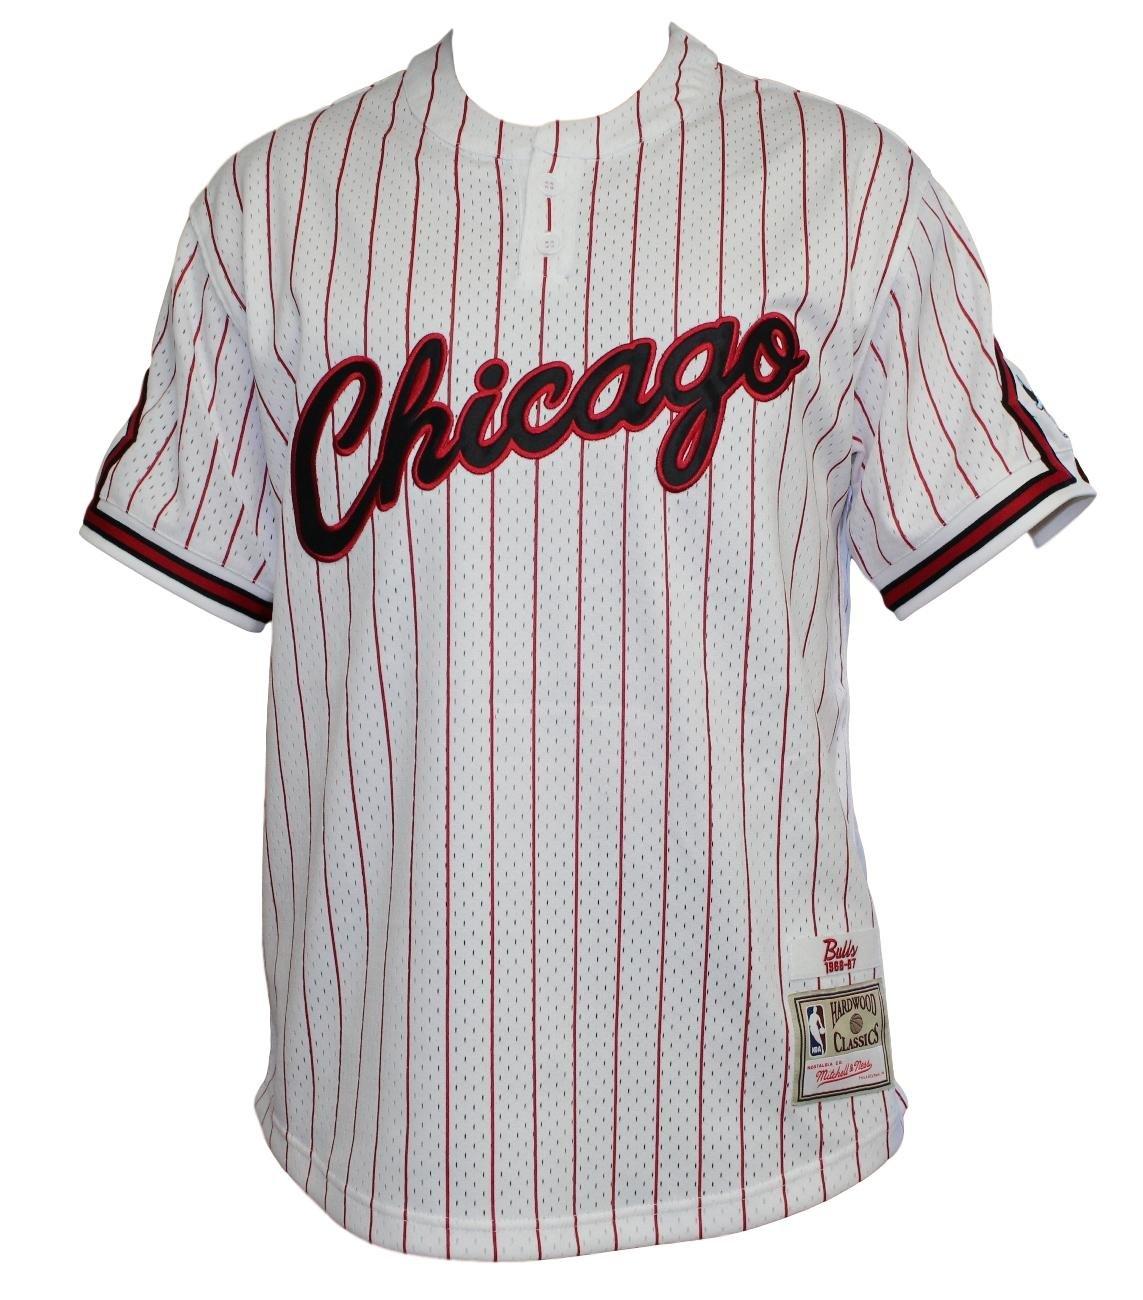 Chicago Bulls Mitchell & Ness - Gorra de hombre blanco Pinstriped malla de béisbol Jersey camiseta: Amazon.es: Deportes y aire libre